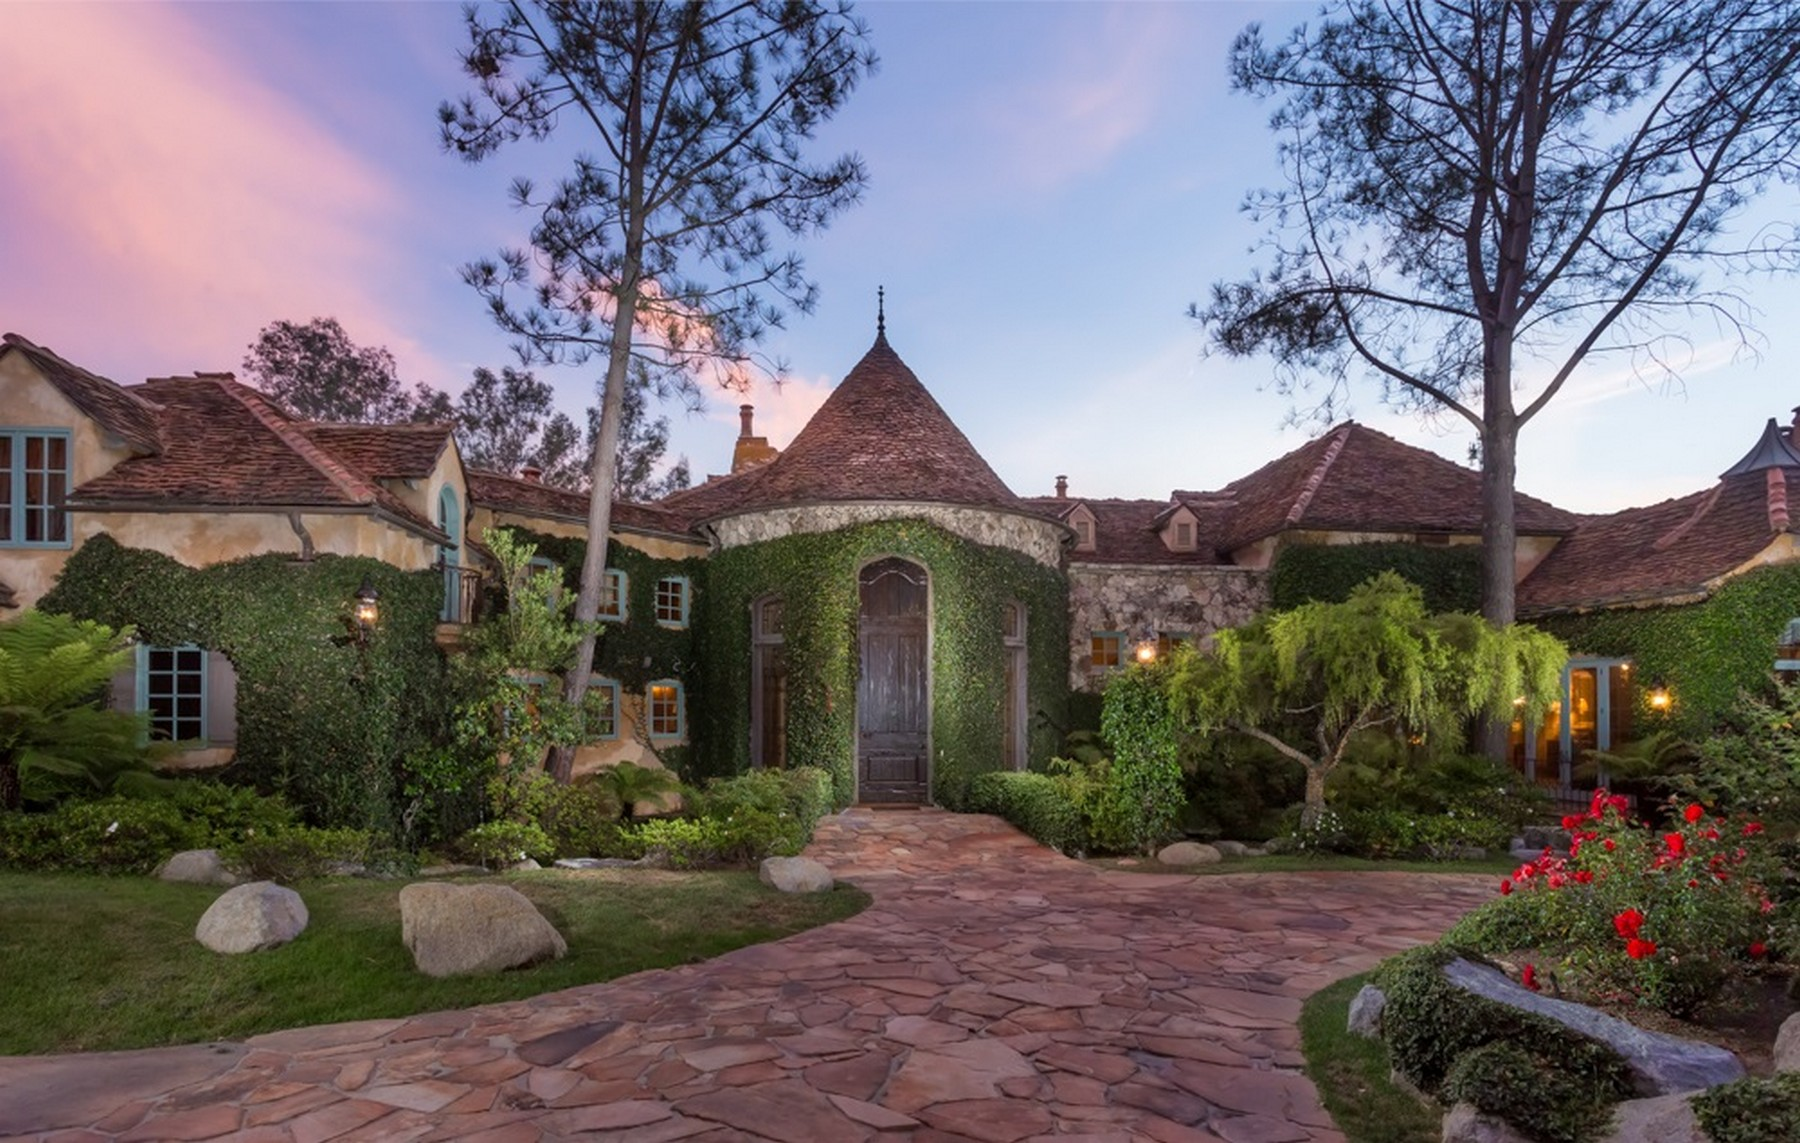 Single Family Home for Sale at Fairbanks 16902 Via Cuesta Verde Rancho Santa Fe, California 92067 United States